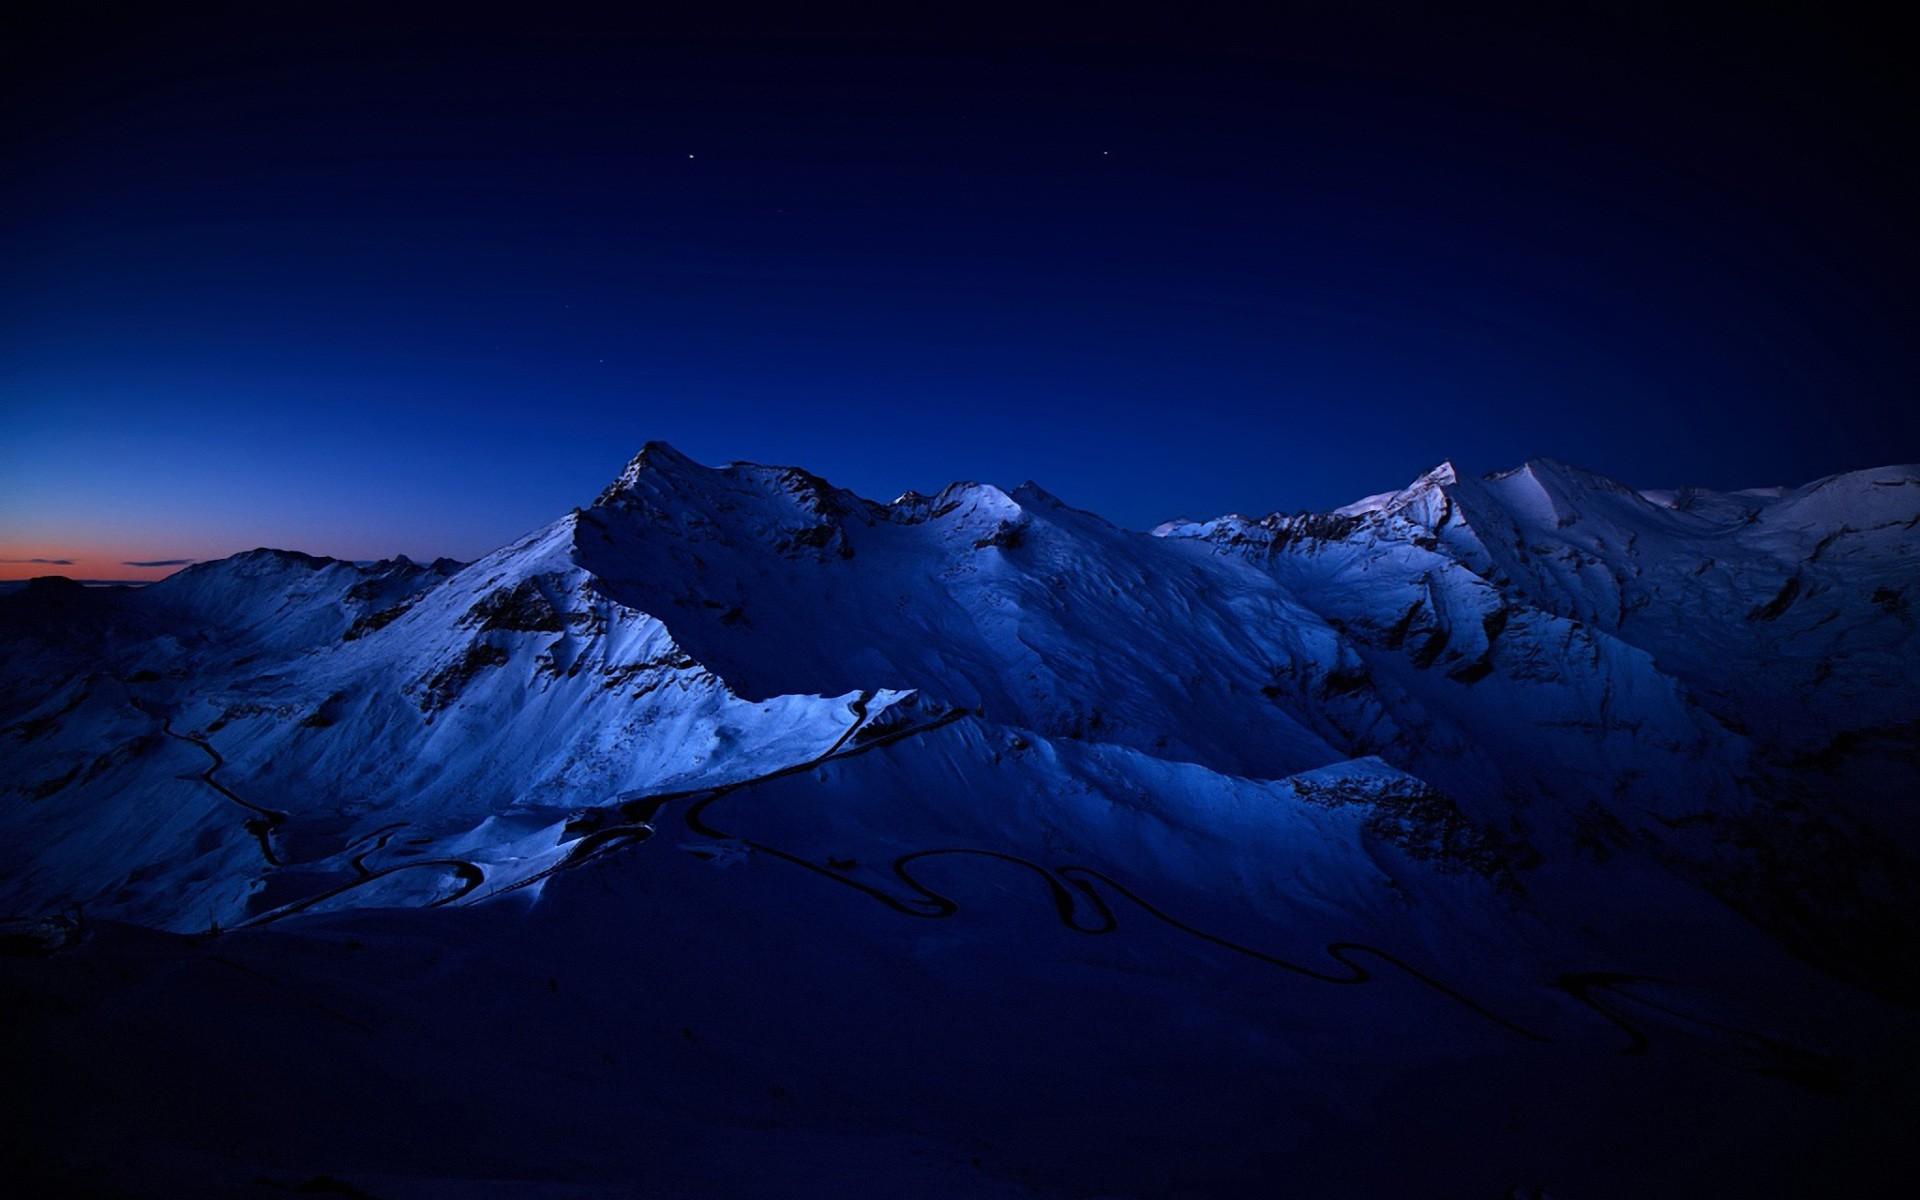 Night Mountain Desktop Wallpaper HD Resolution